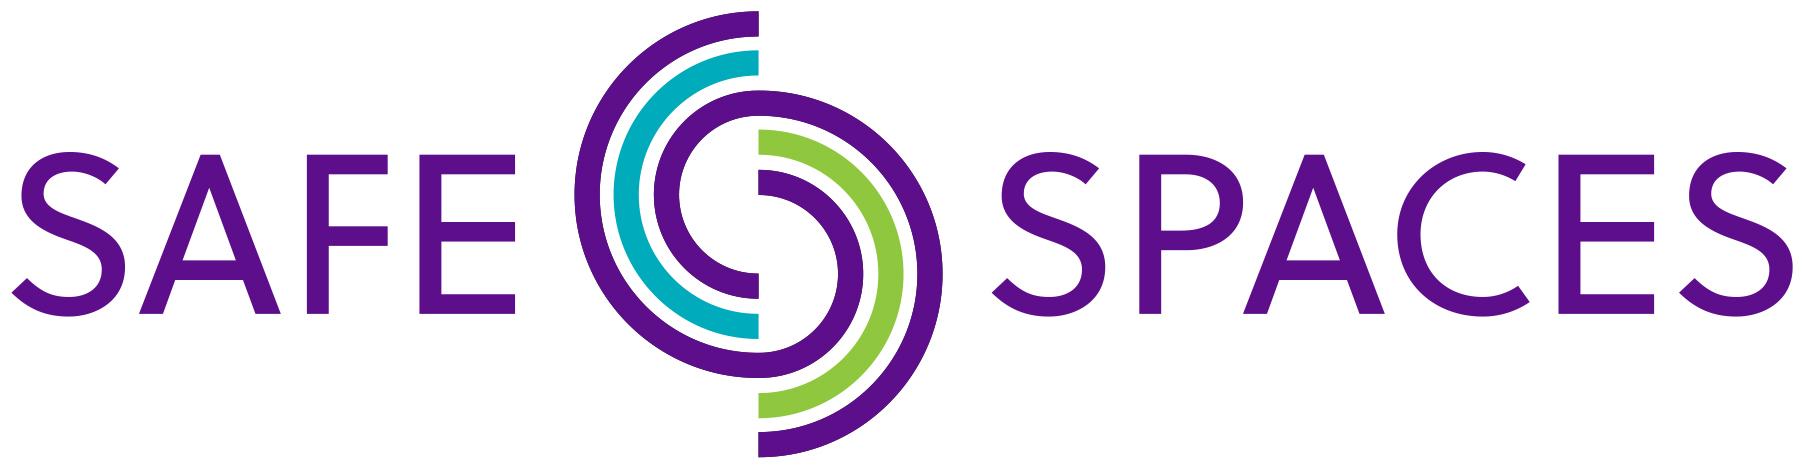 The Safe Spaces logo